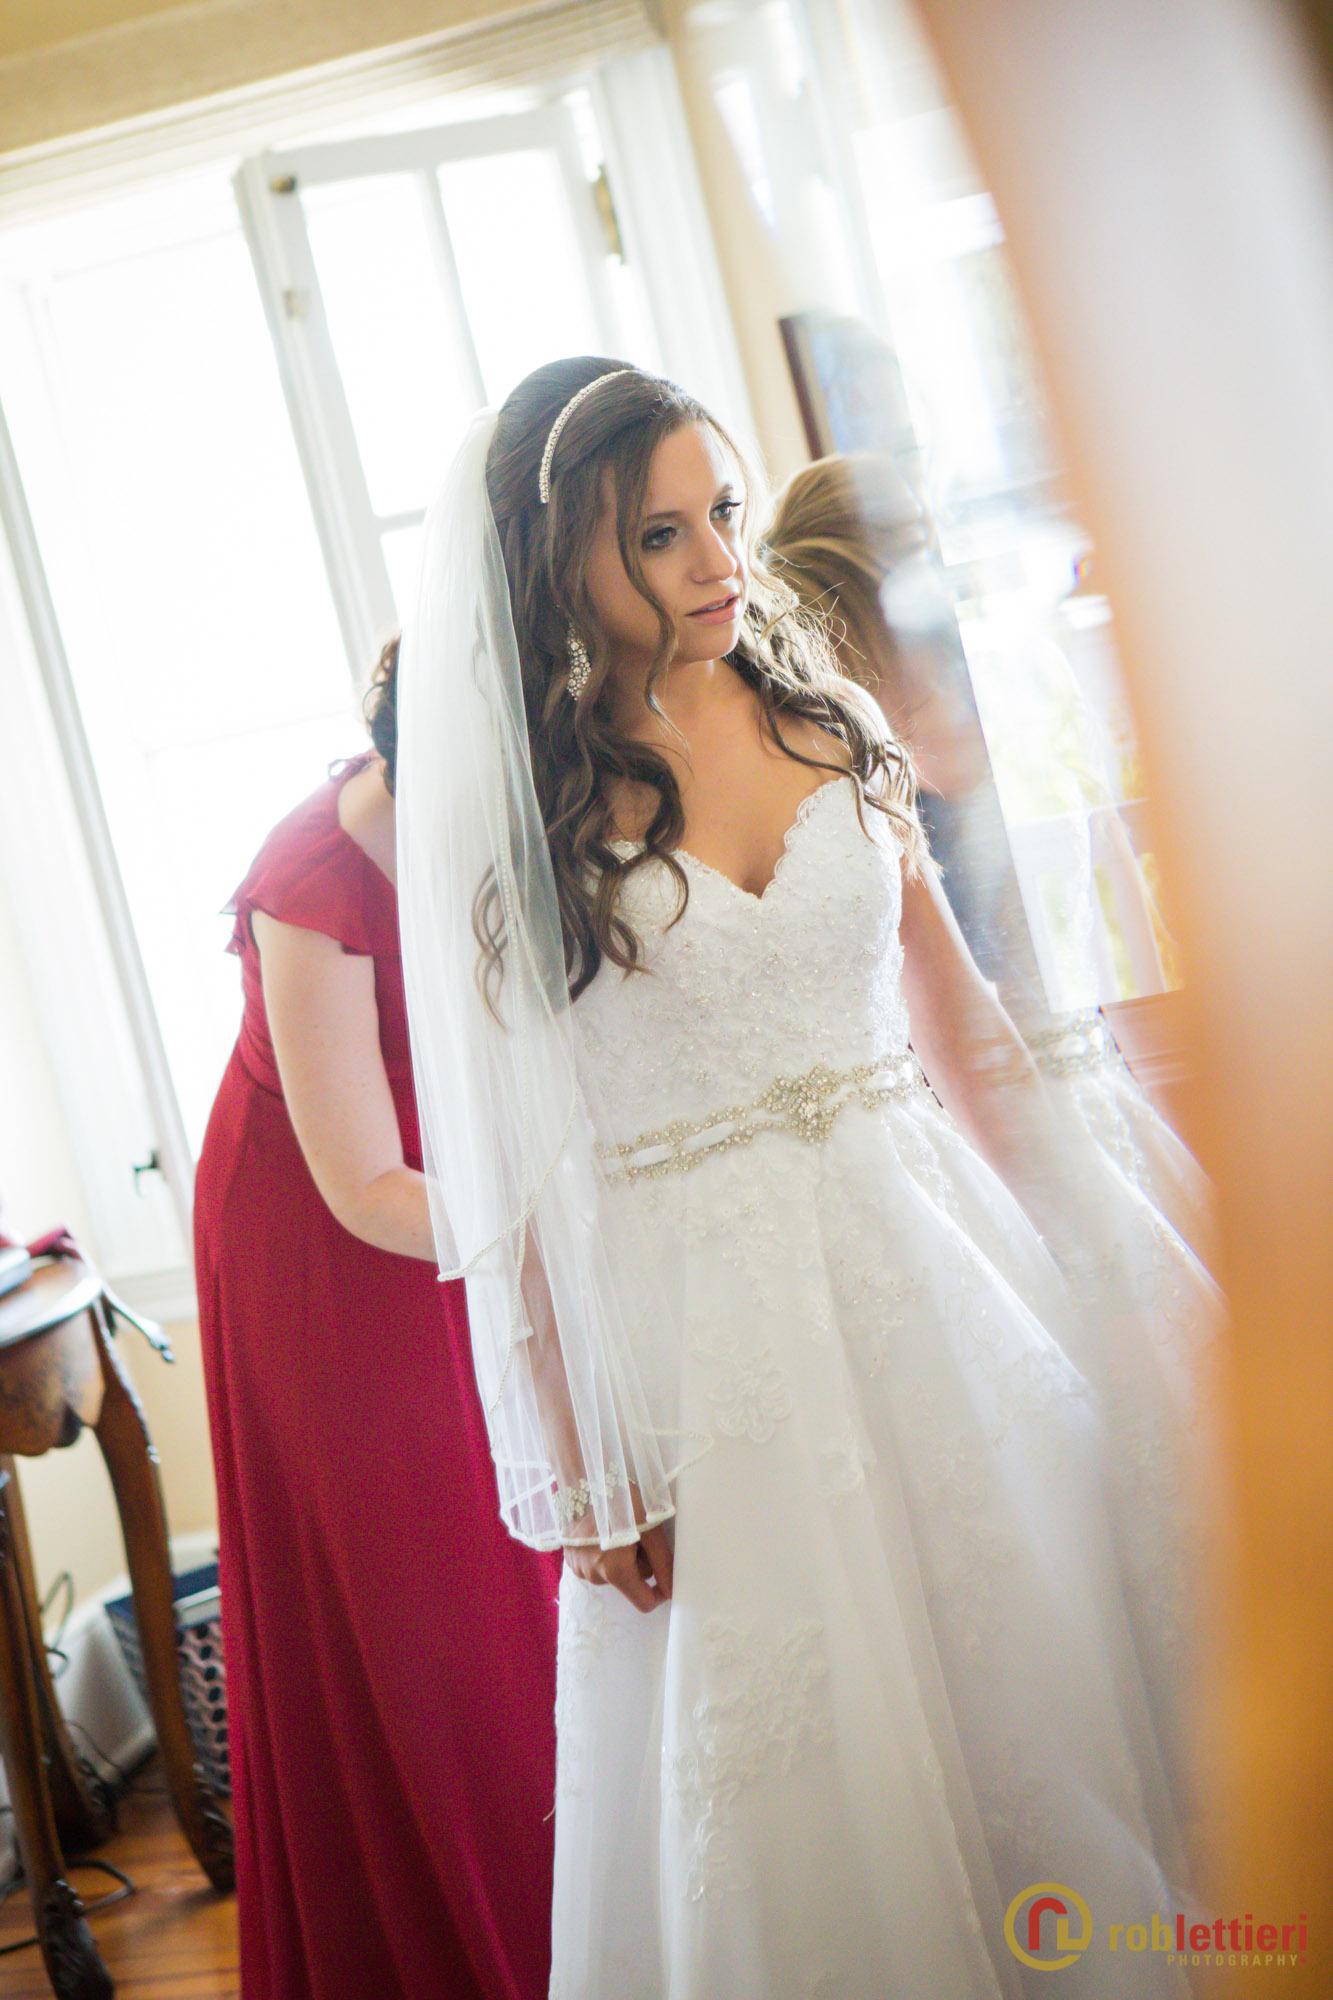 scranton_wedding_photographer_lettieri_pa-0070.jpg